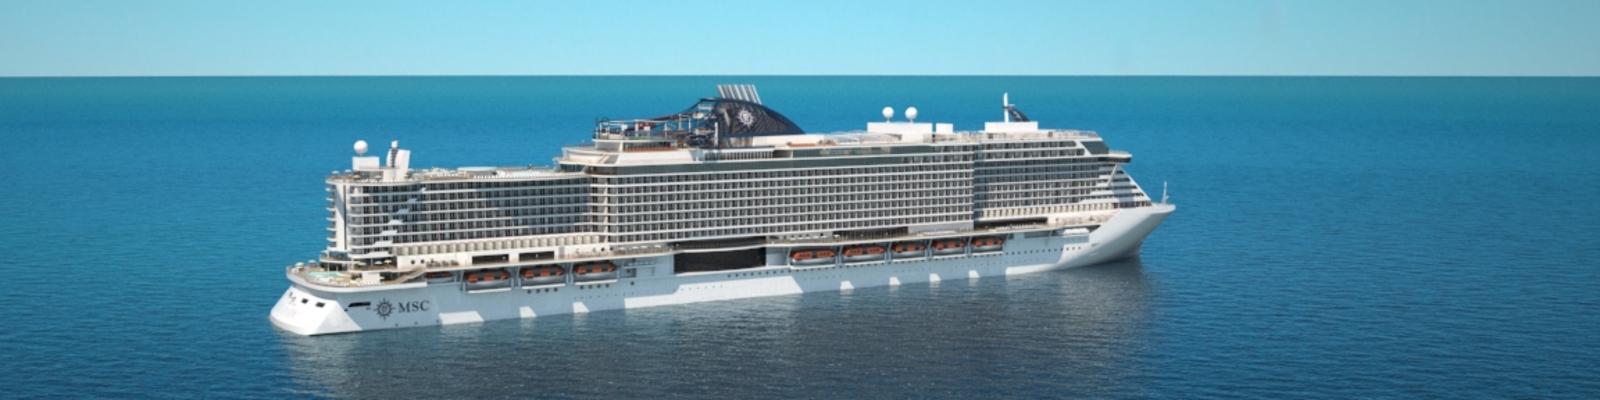 MSC Seaside (Image: MSC Cruises)